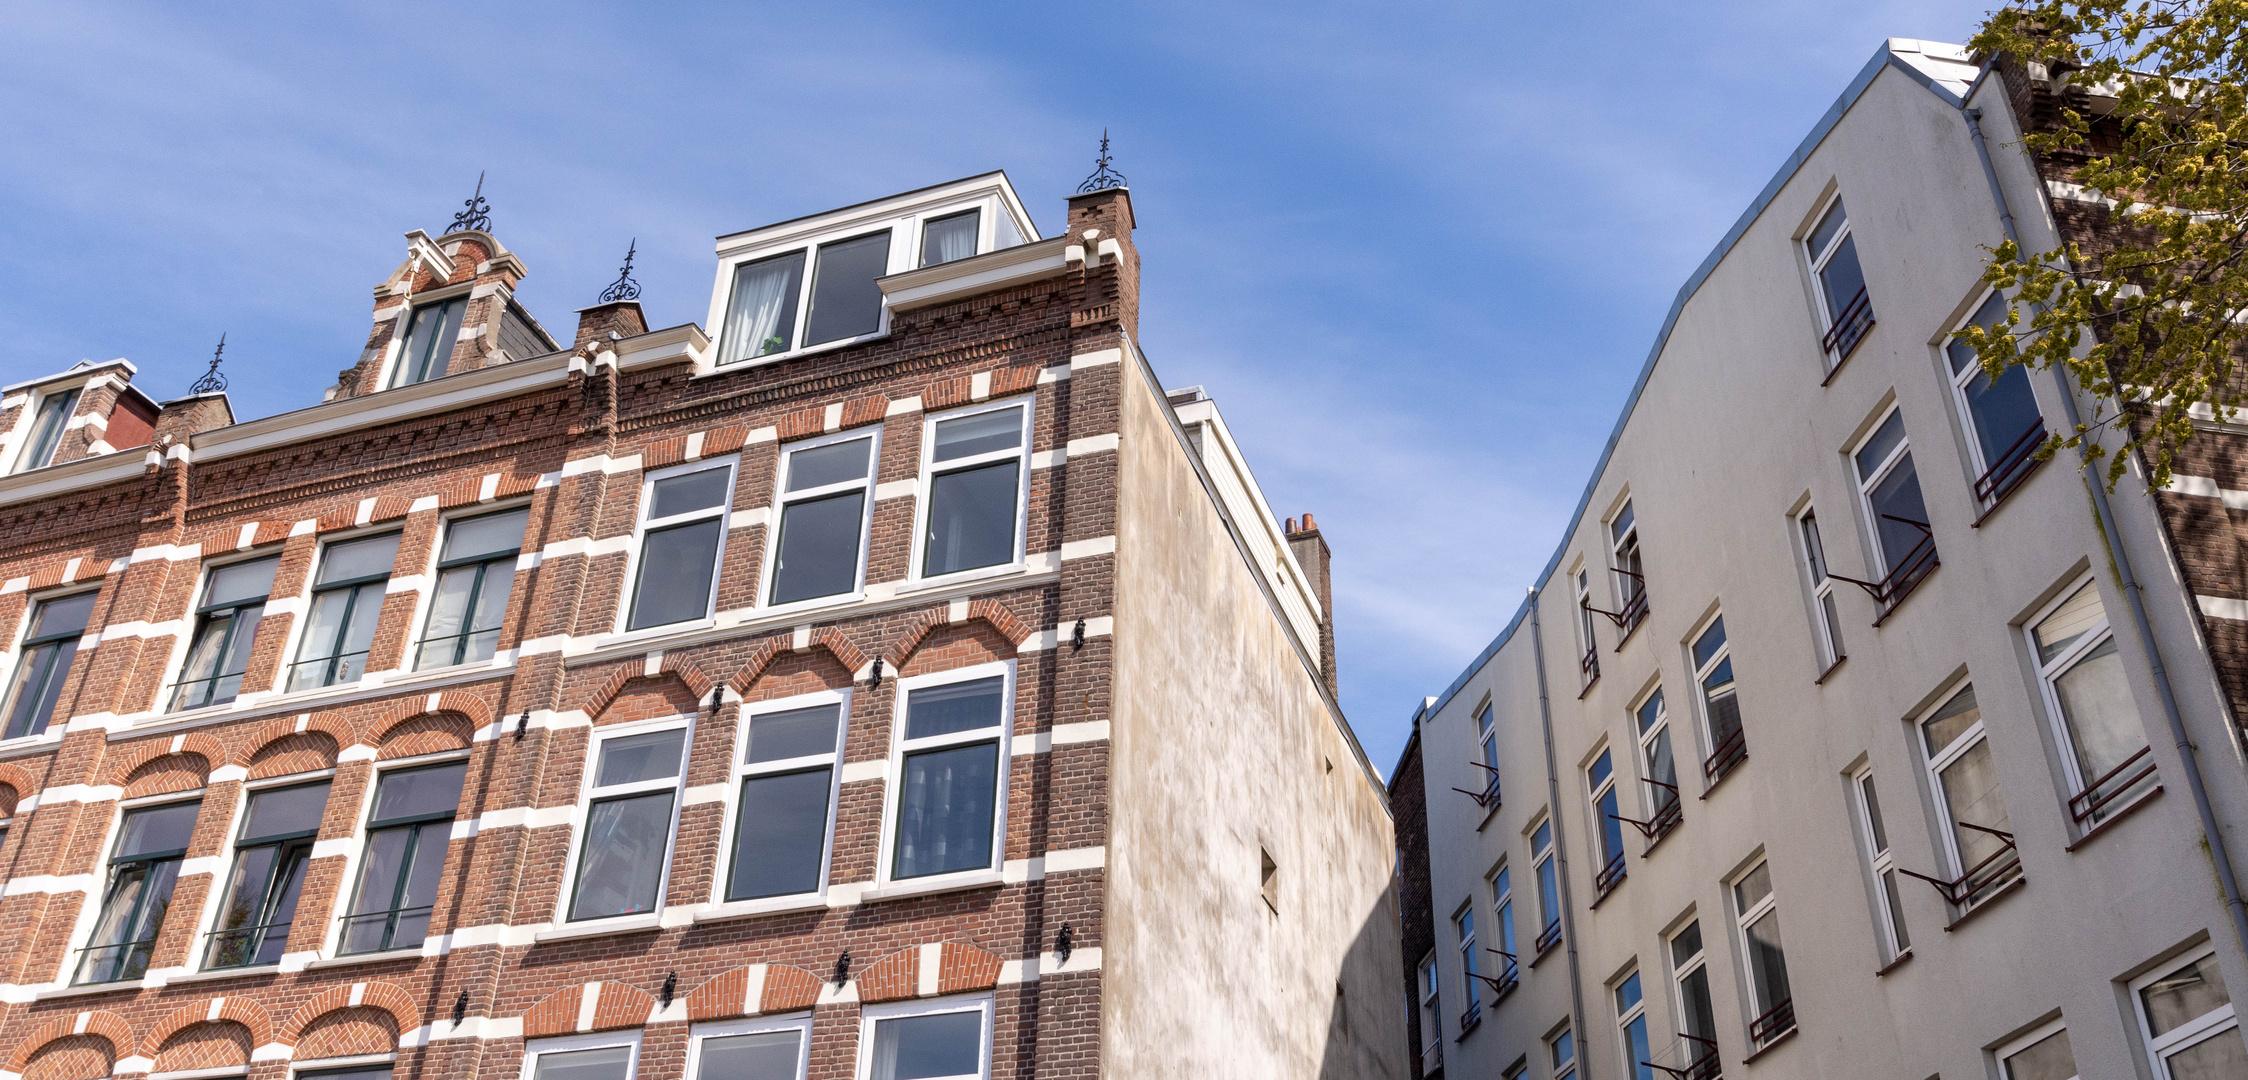 Amsterdam - Zeeheldenbuurt - Houtmankade - 03